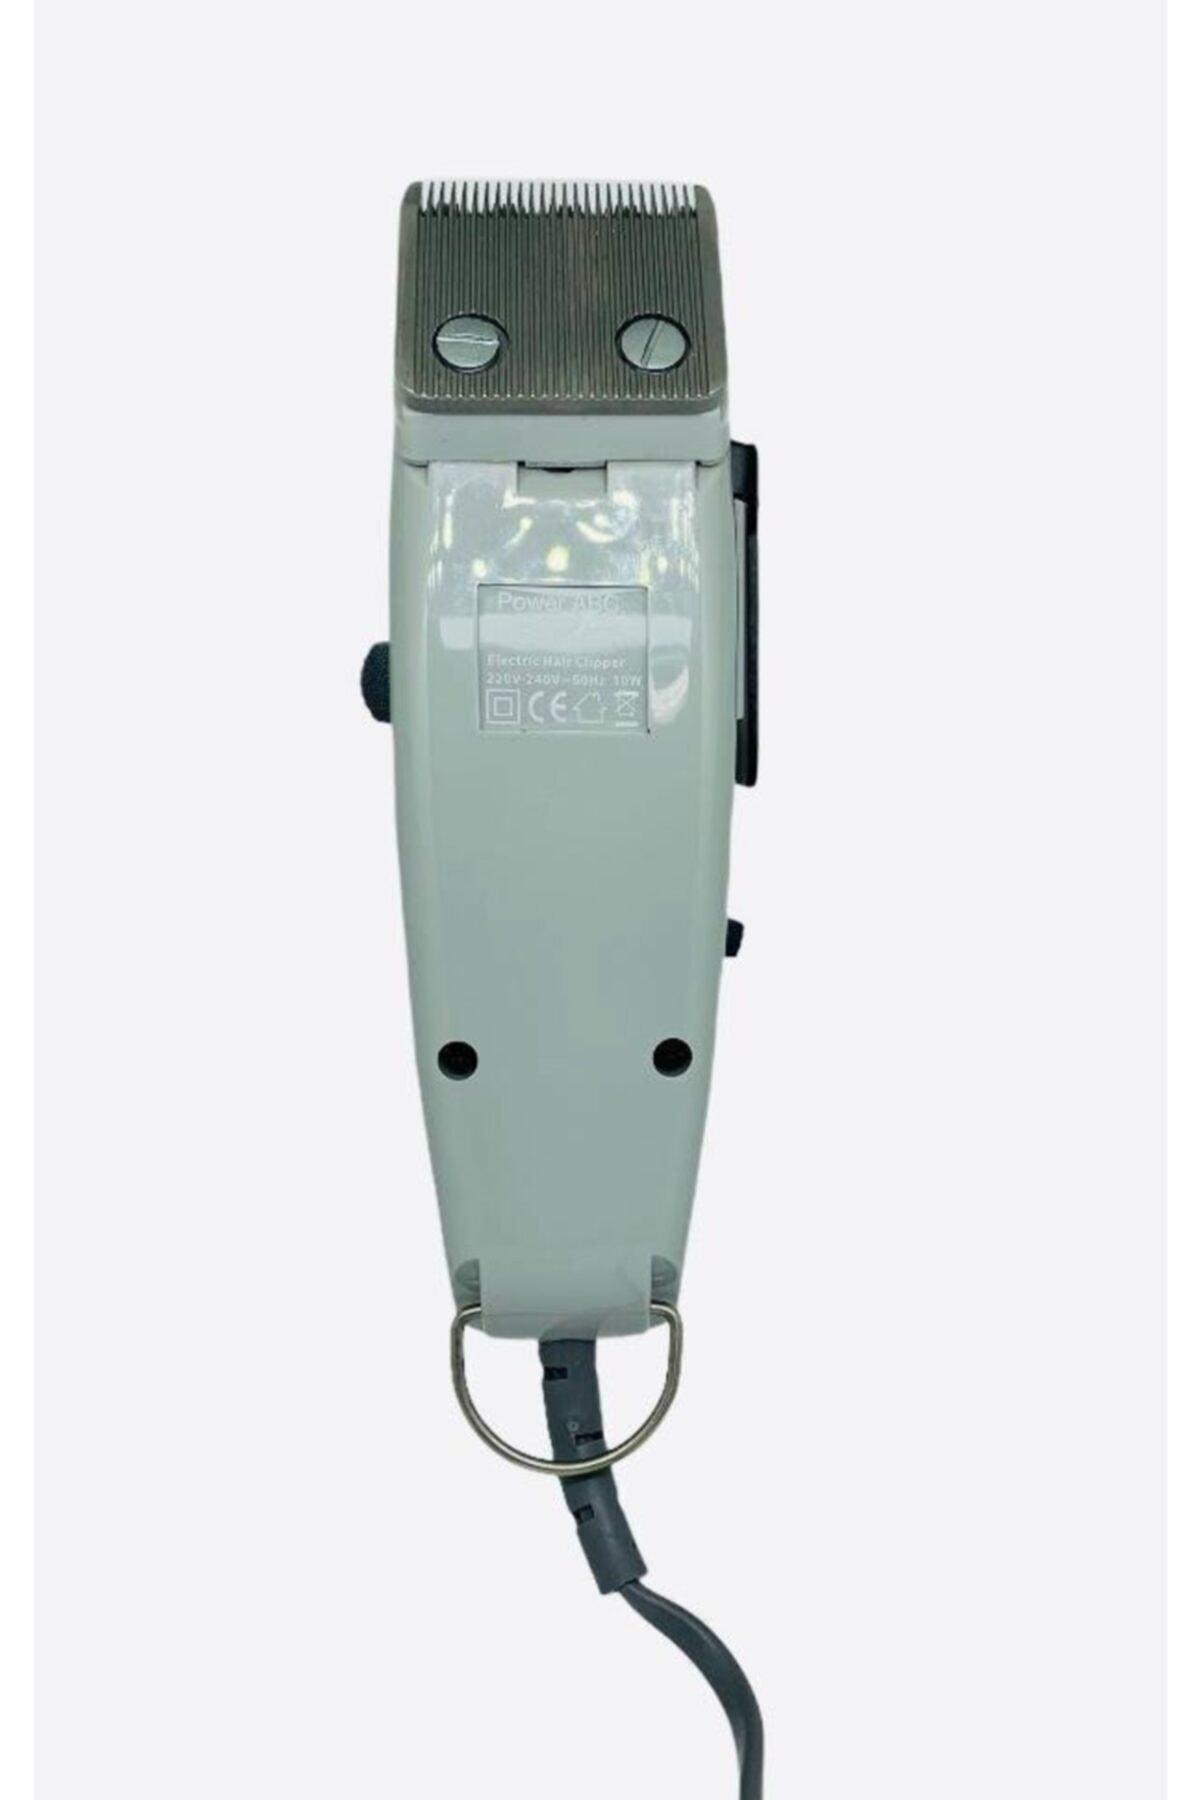 HESCOM Power Abc 666 Kaliteli Saç Sakal Kesme Makinesi 2